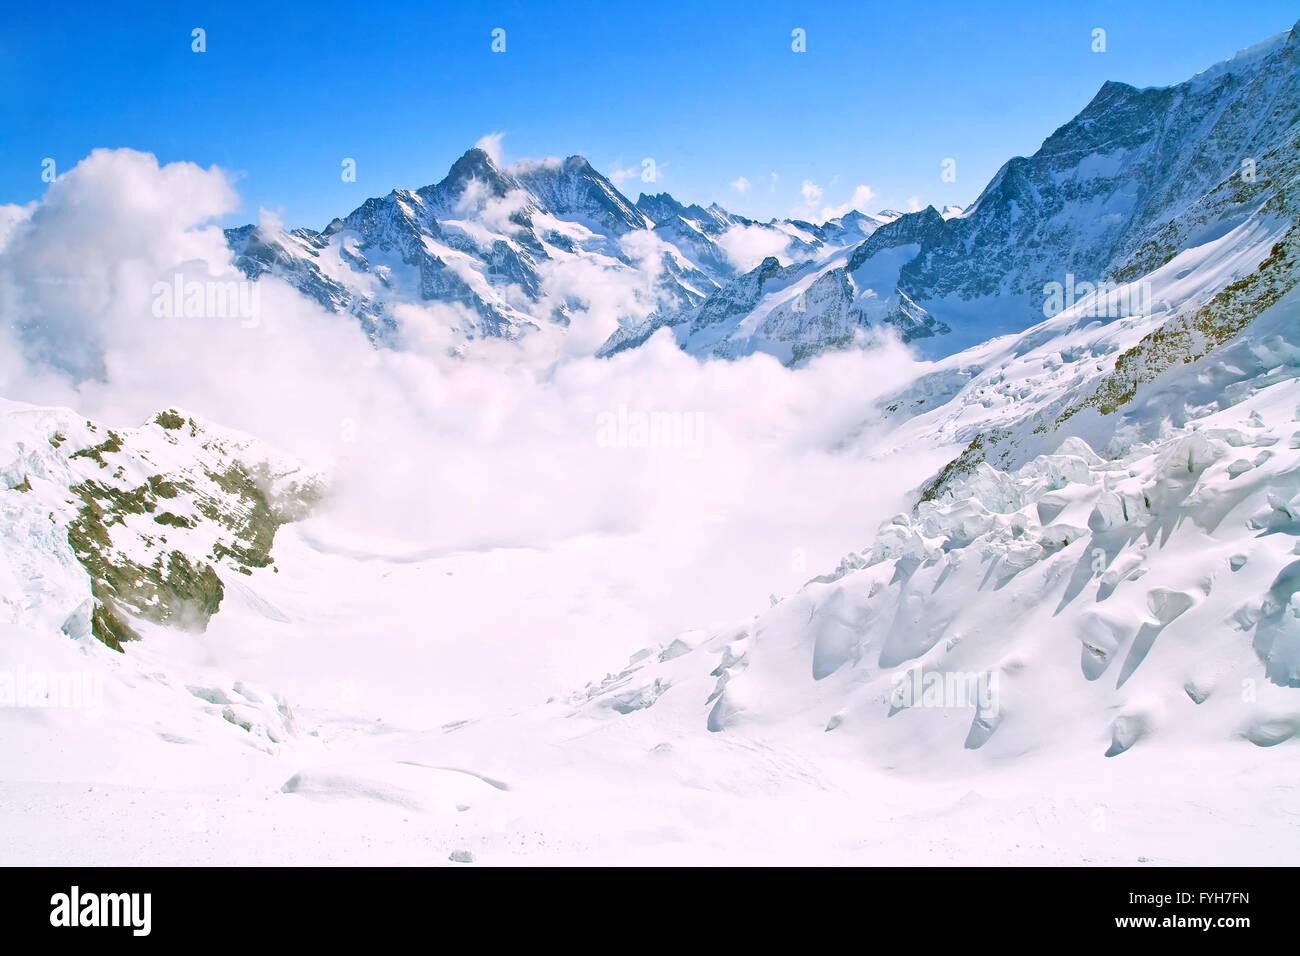 Landscape of Mist at Jungfraujoch, part of Swiss Alpine Alps and ski path at Interlaken Switzerland. - Stock Image